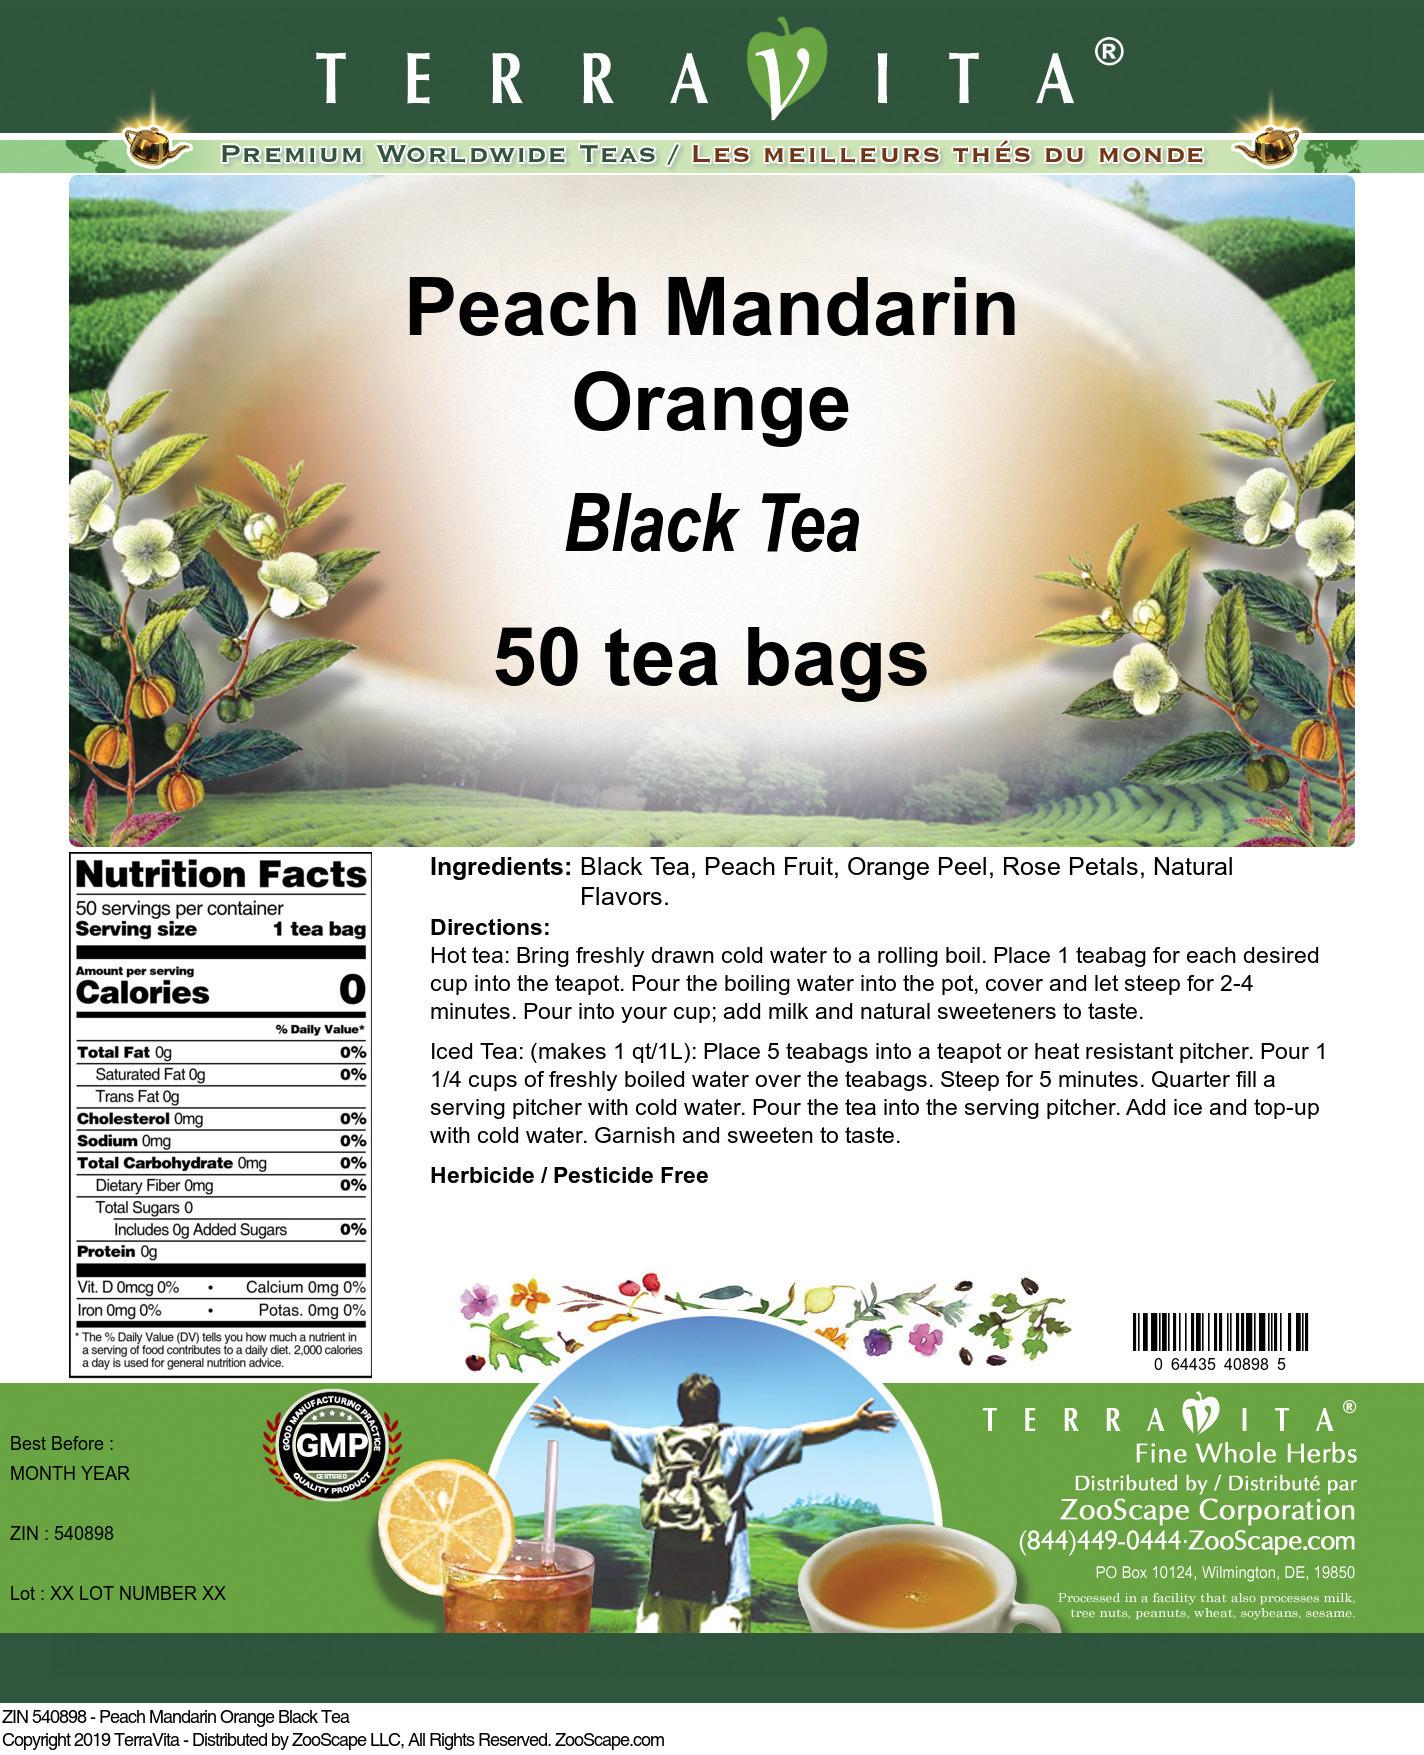 Peach Mandarin Orange Black Tea